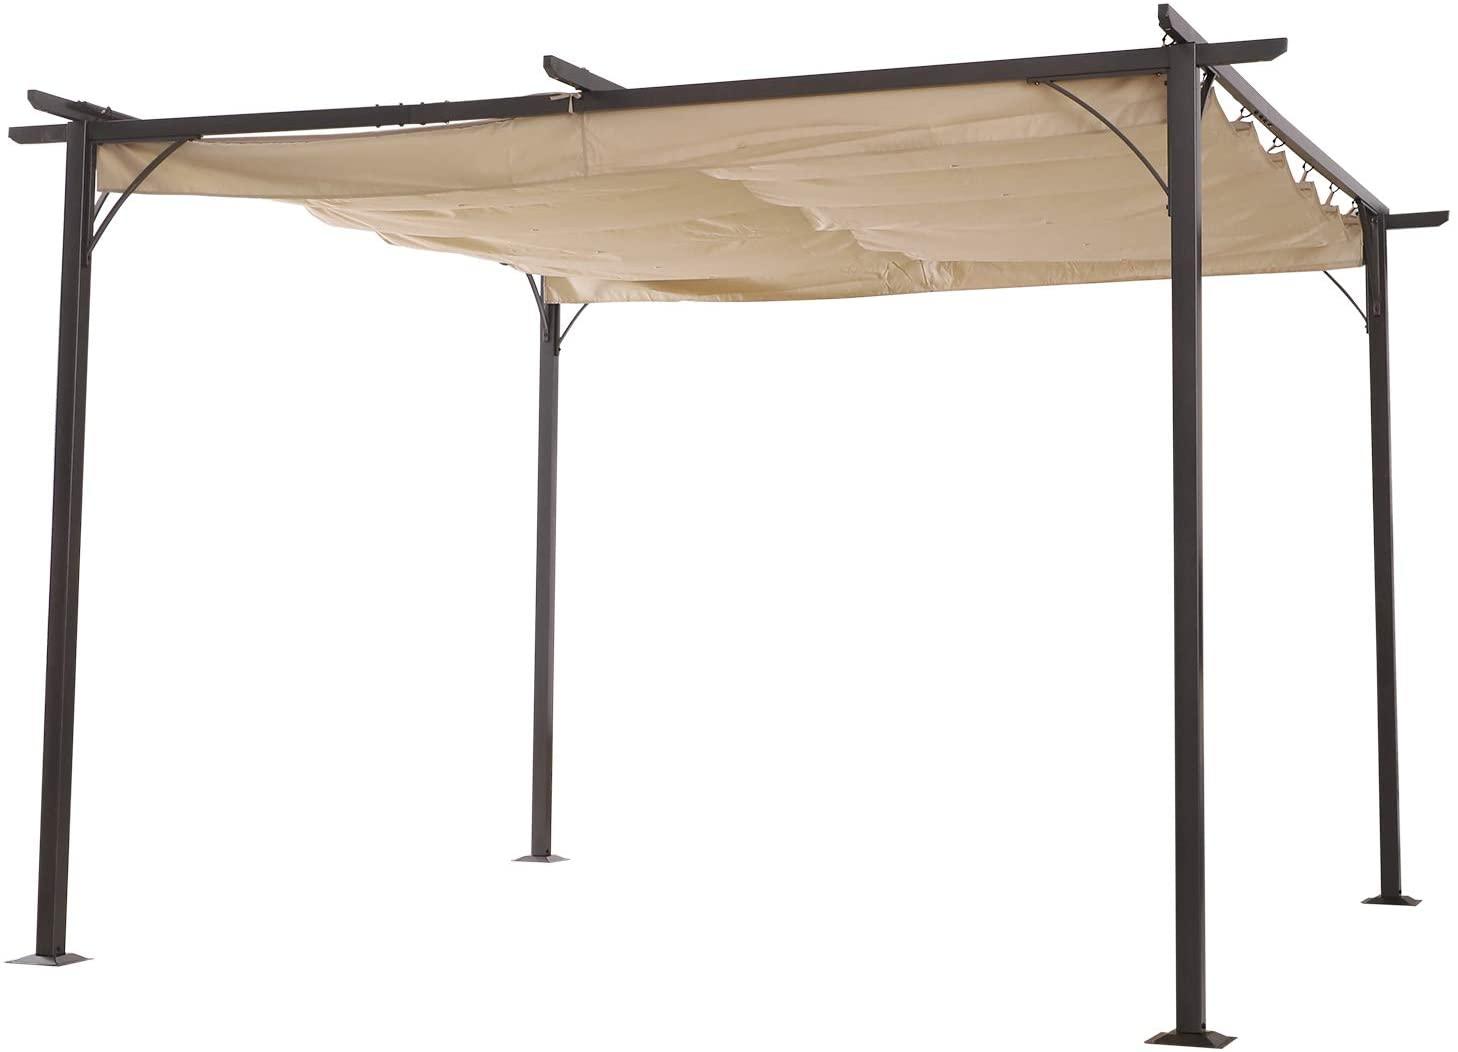 Pérgola de metal 3.5x3.5m con techo